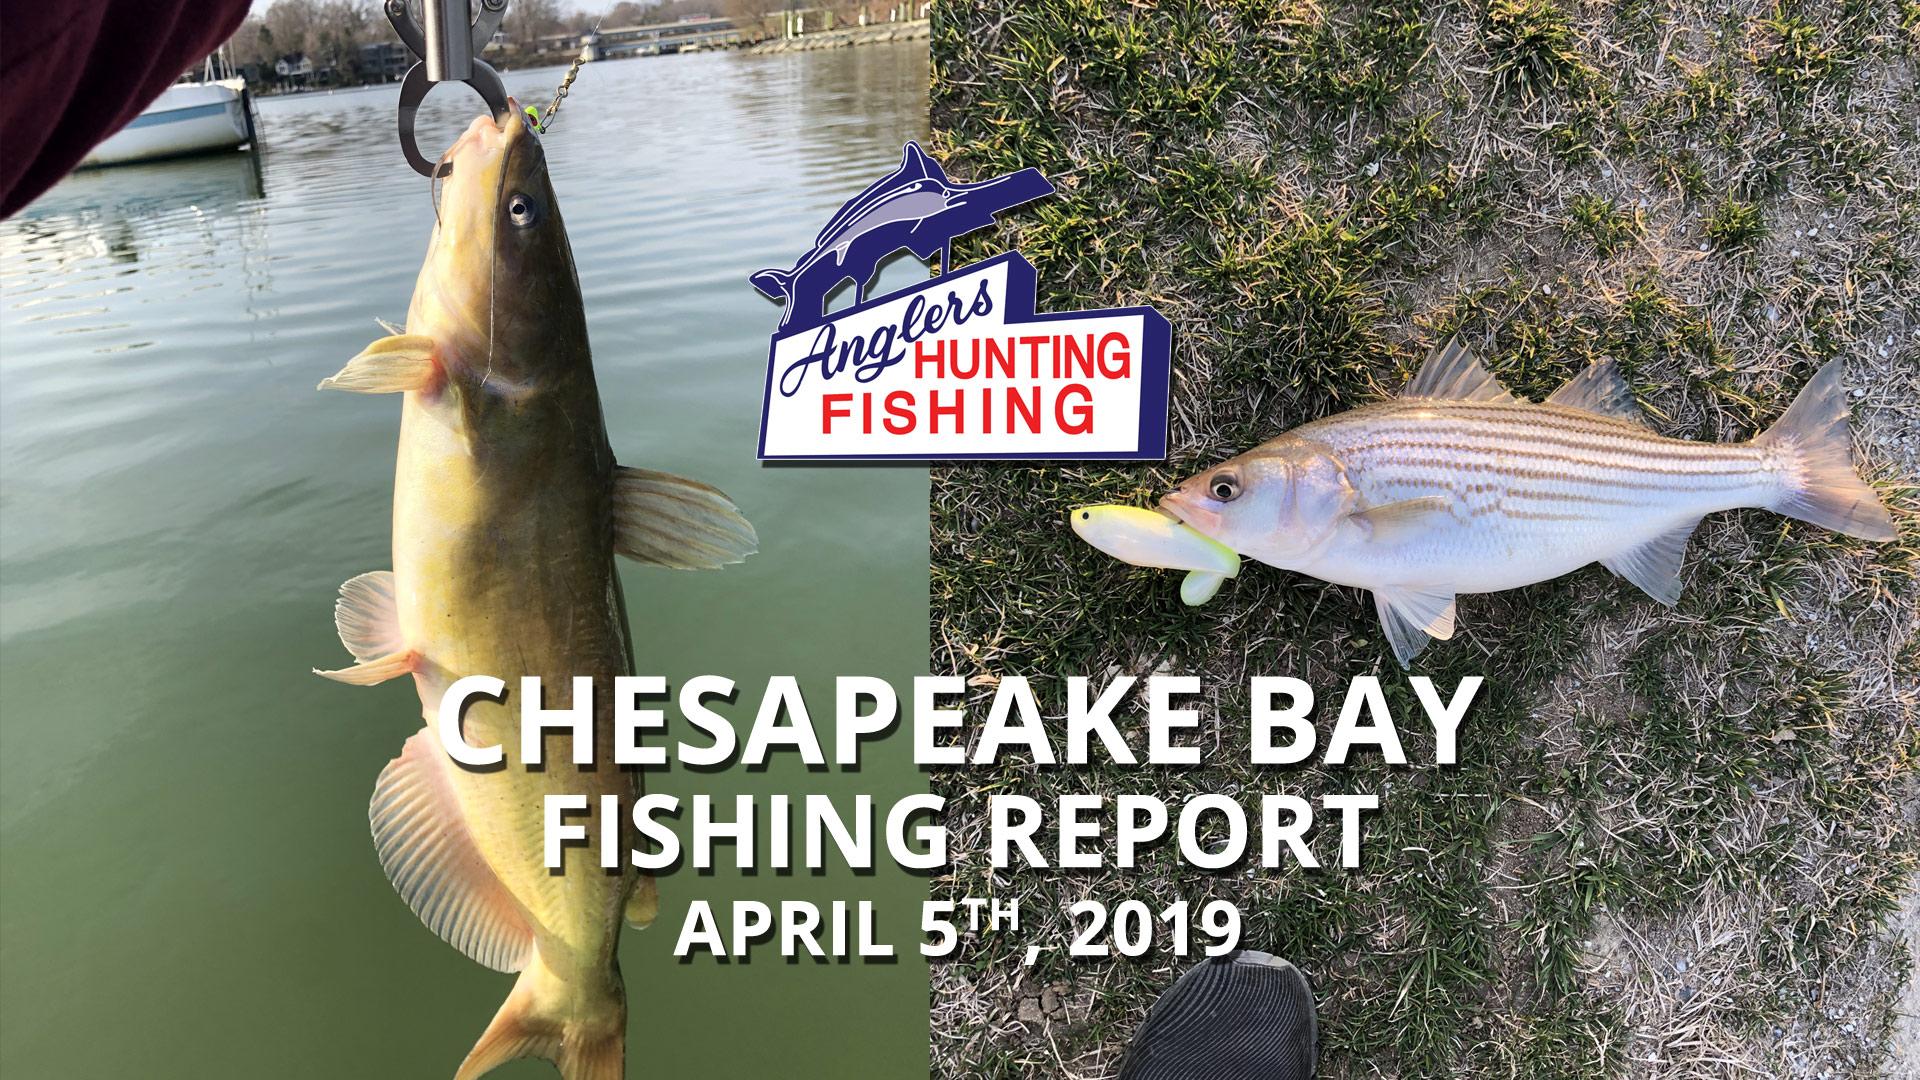 Chesapeake Bay Fishing Report - April 5th, 2019